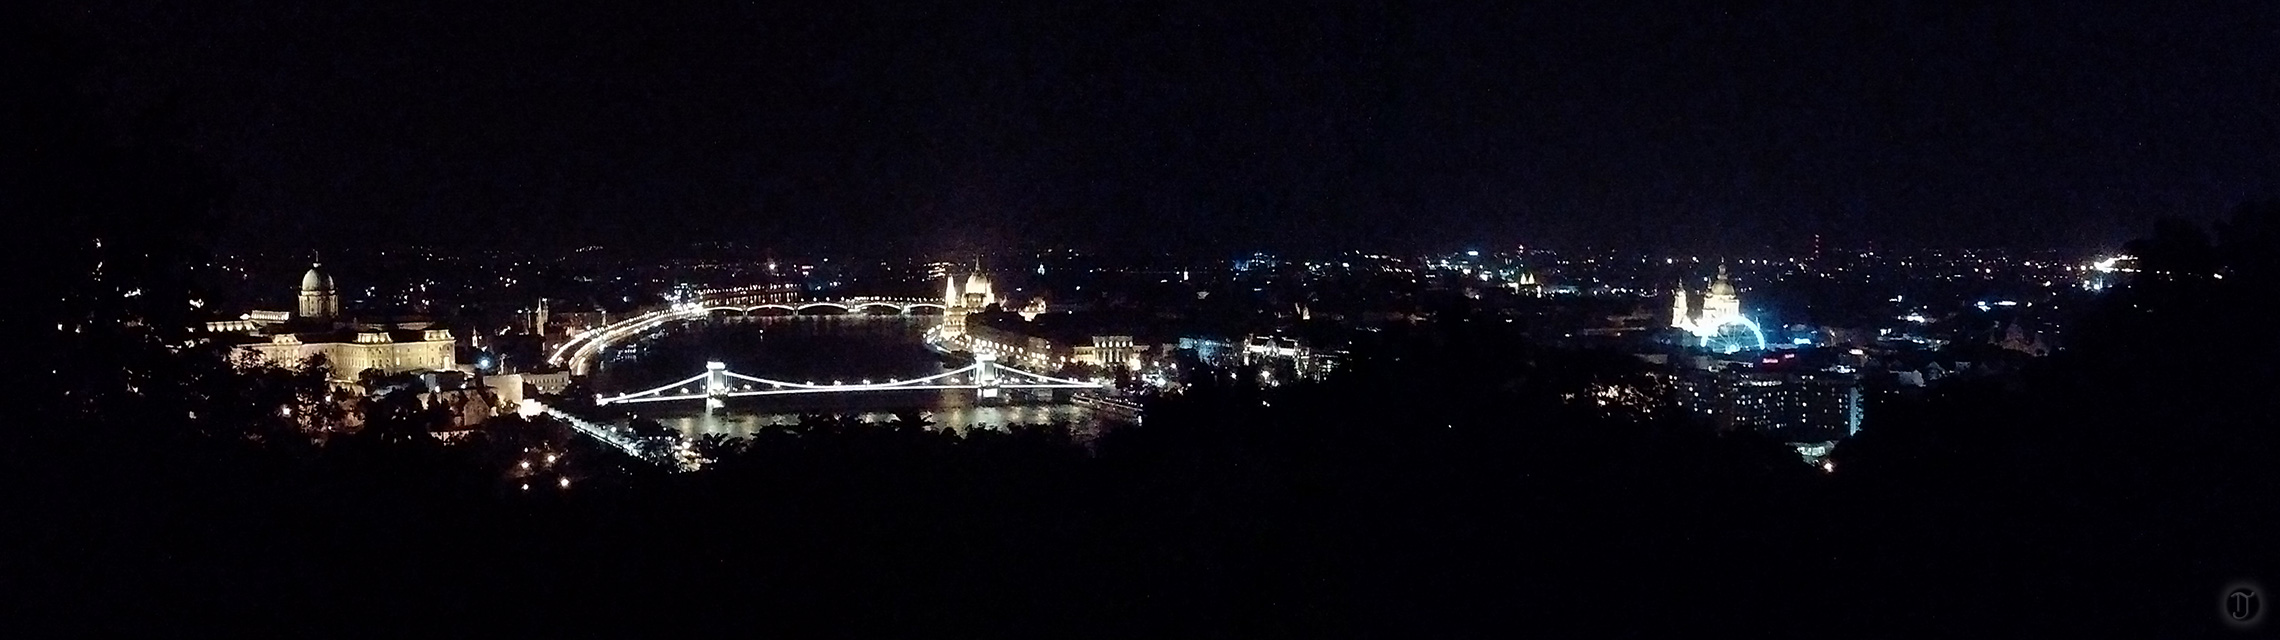 Budapest Panorama at Night